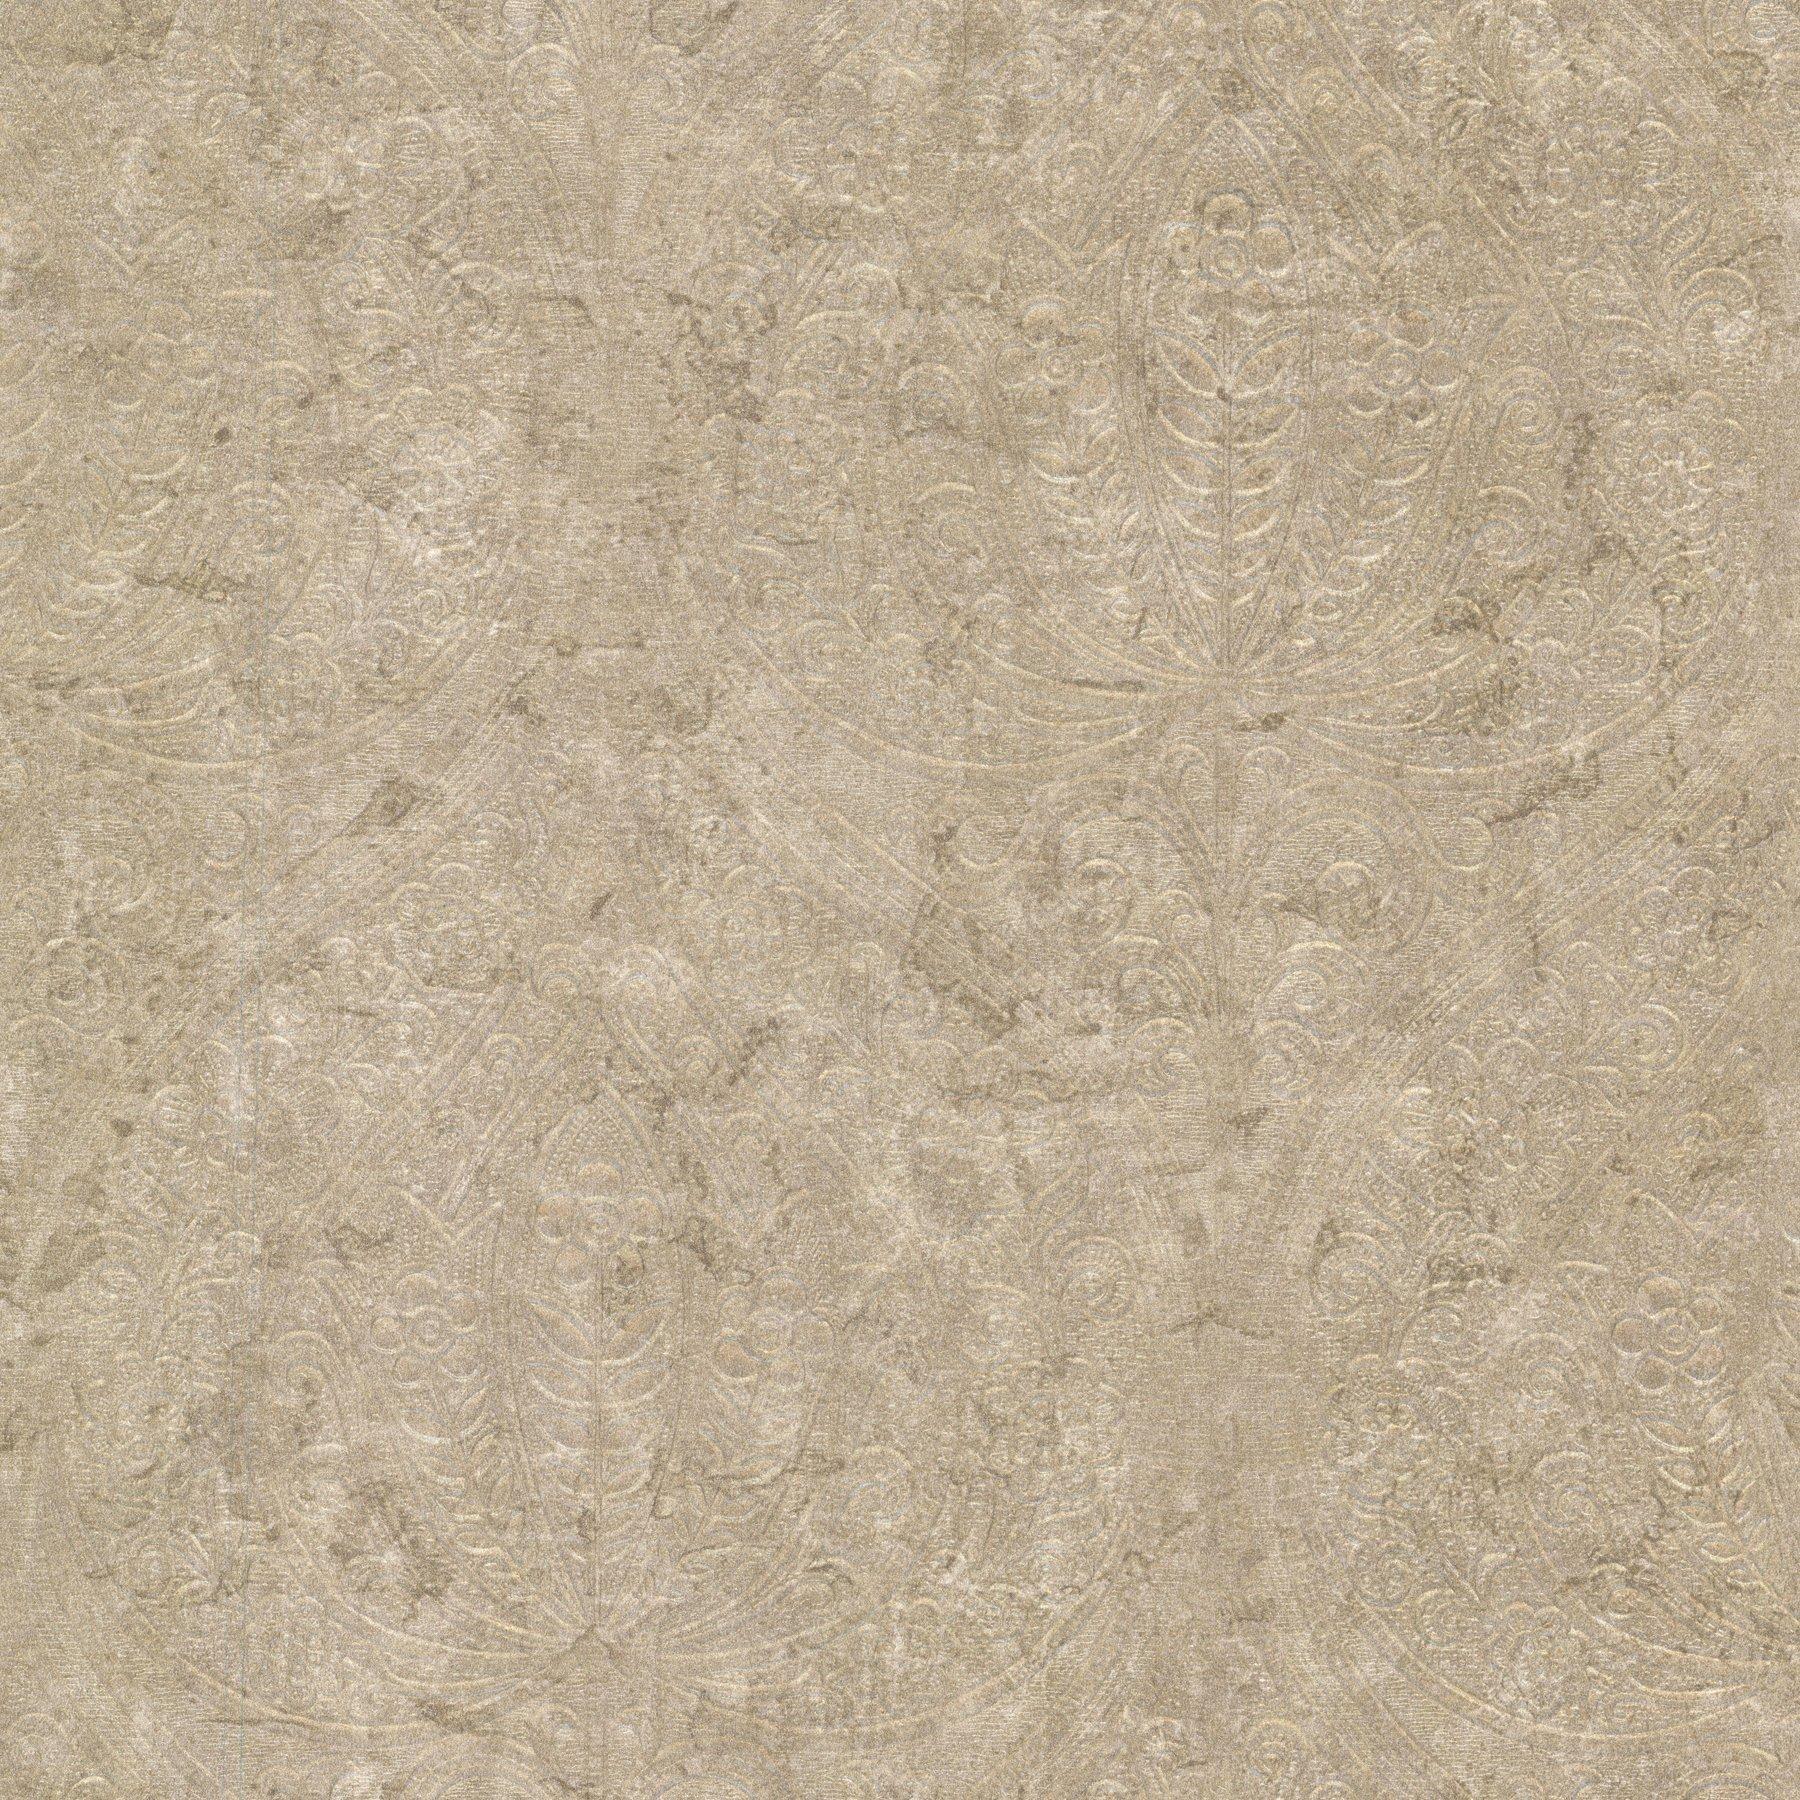 Kenneth James 672-20090 Paolina Embossed Damask Wallpaper, Large, Bronze